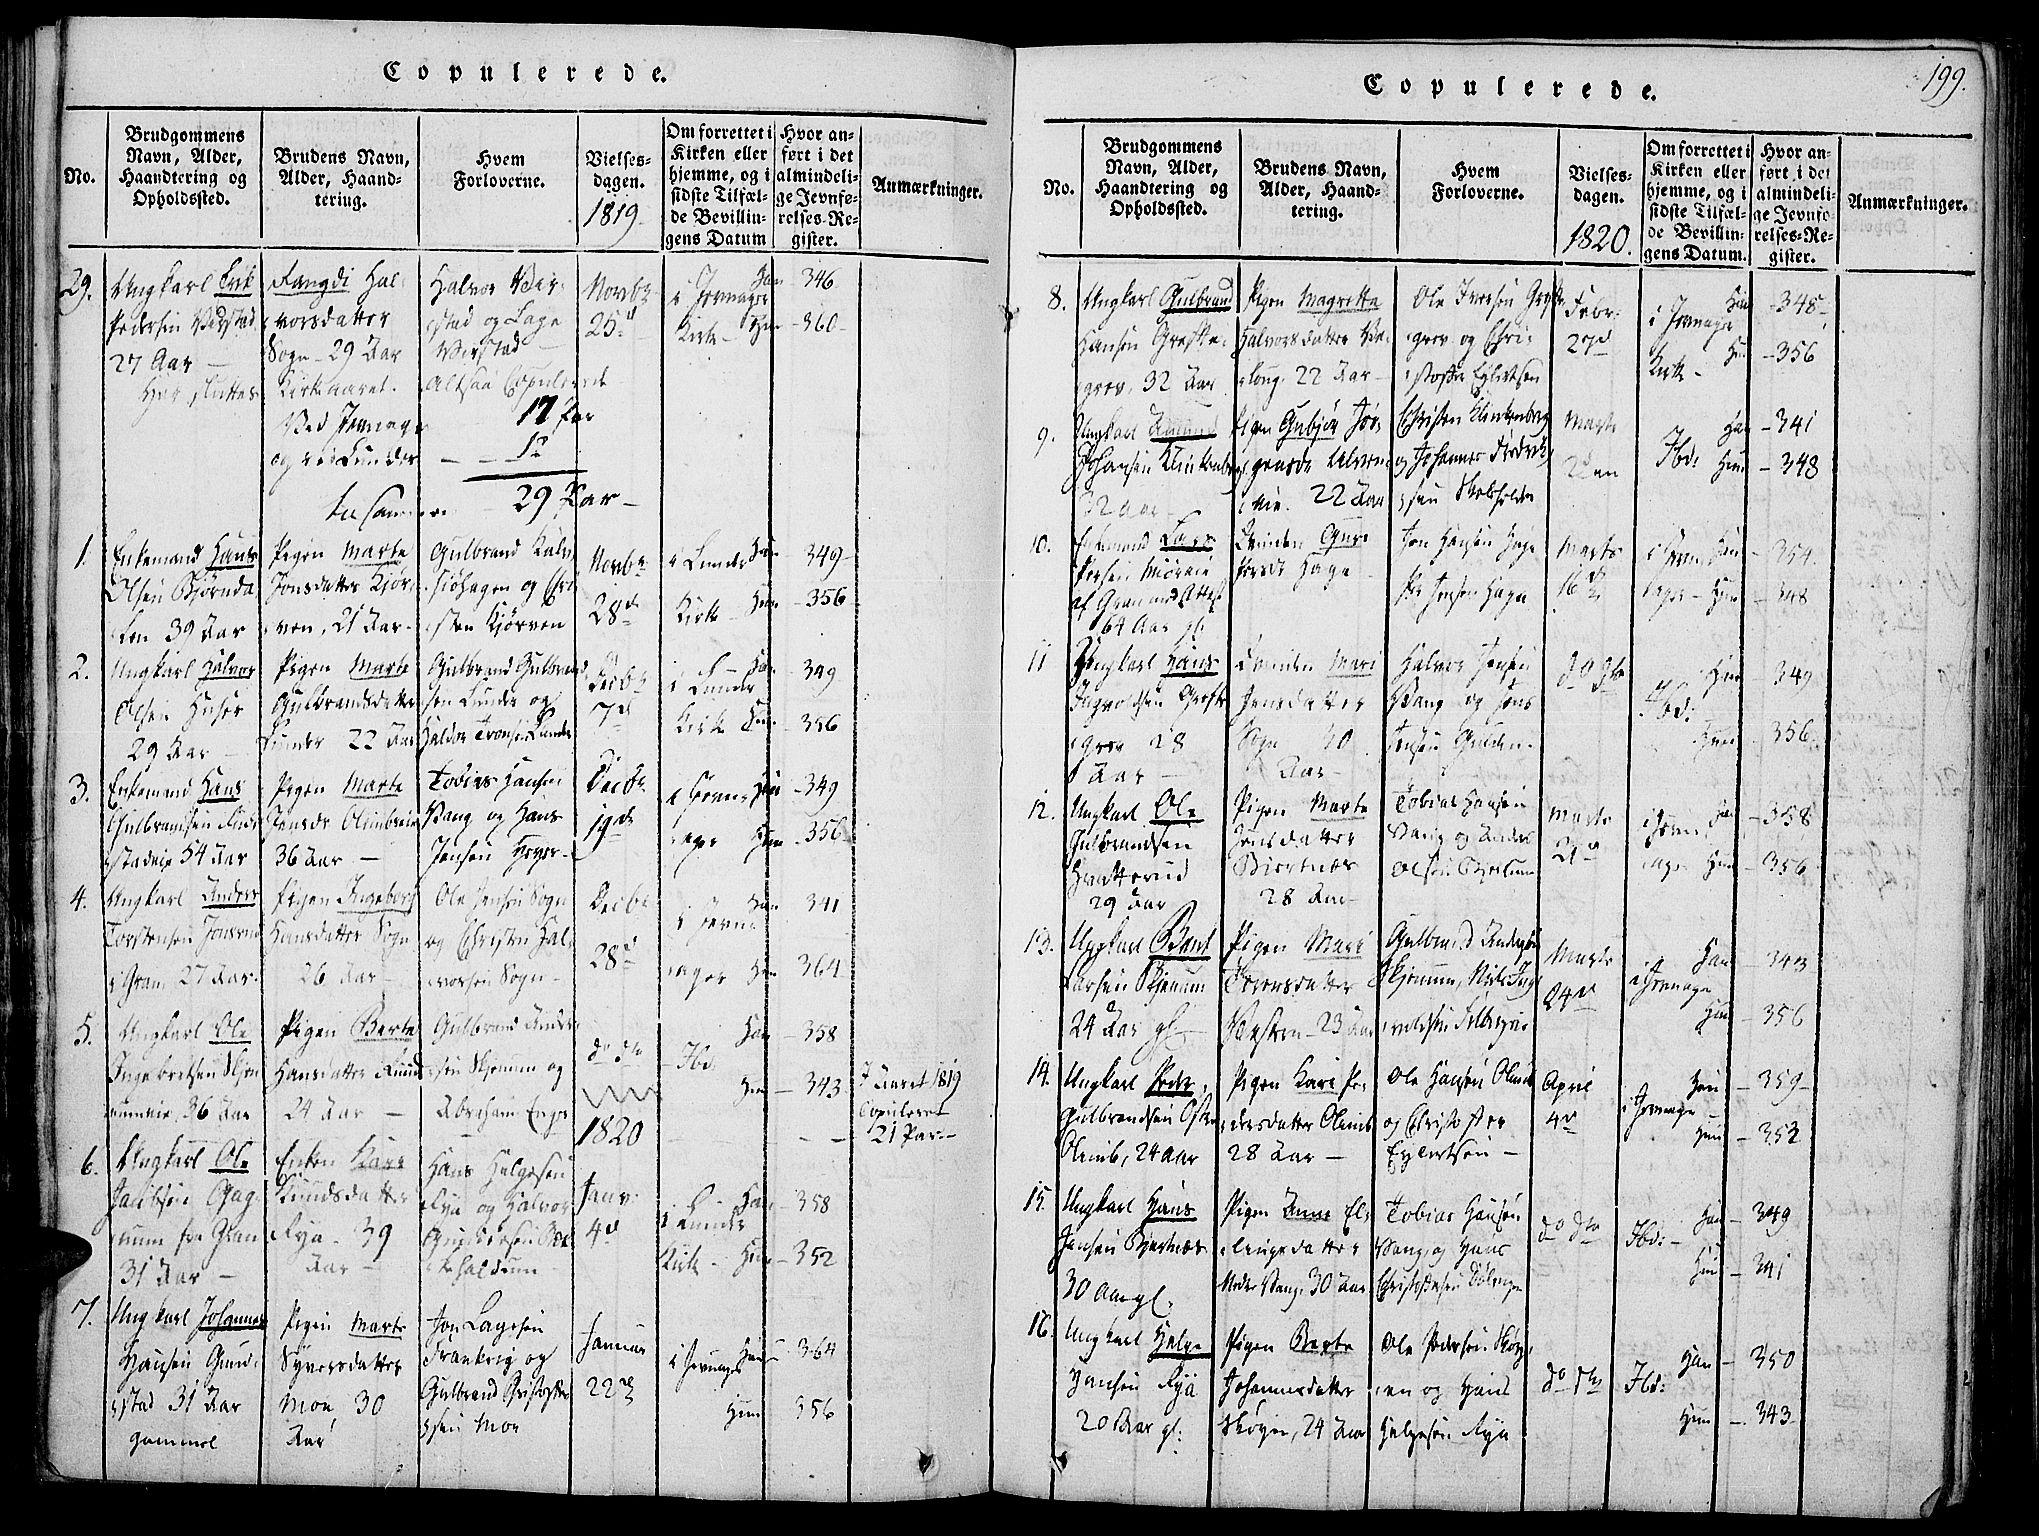 SAH, Jevnaker prestekontor, Ministerialbok nr. 5, 1815-1837, s. 199